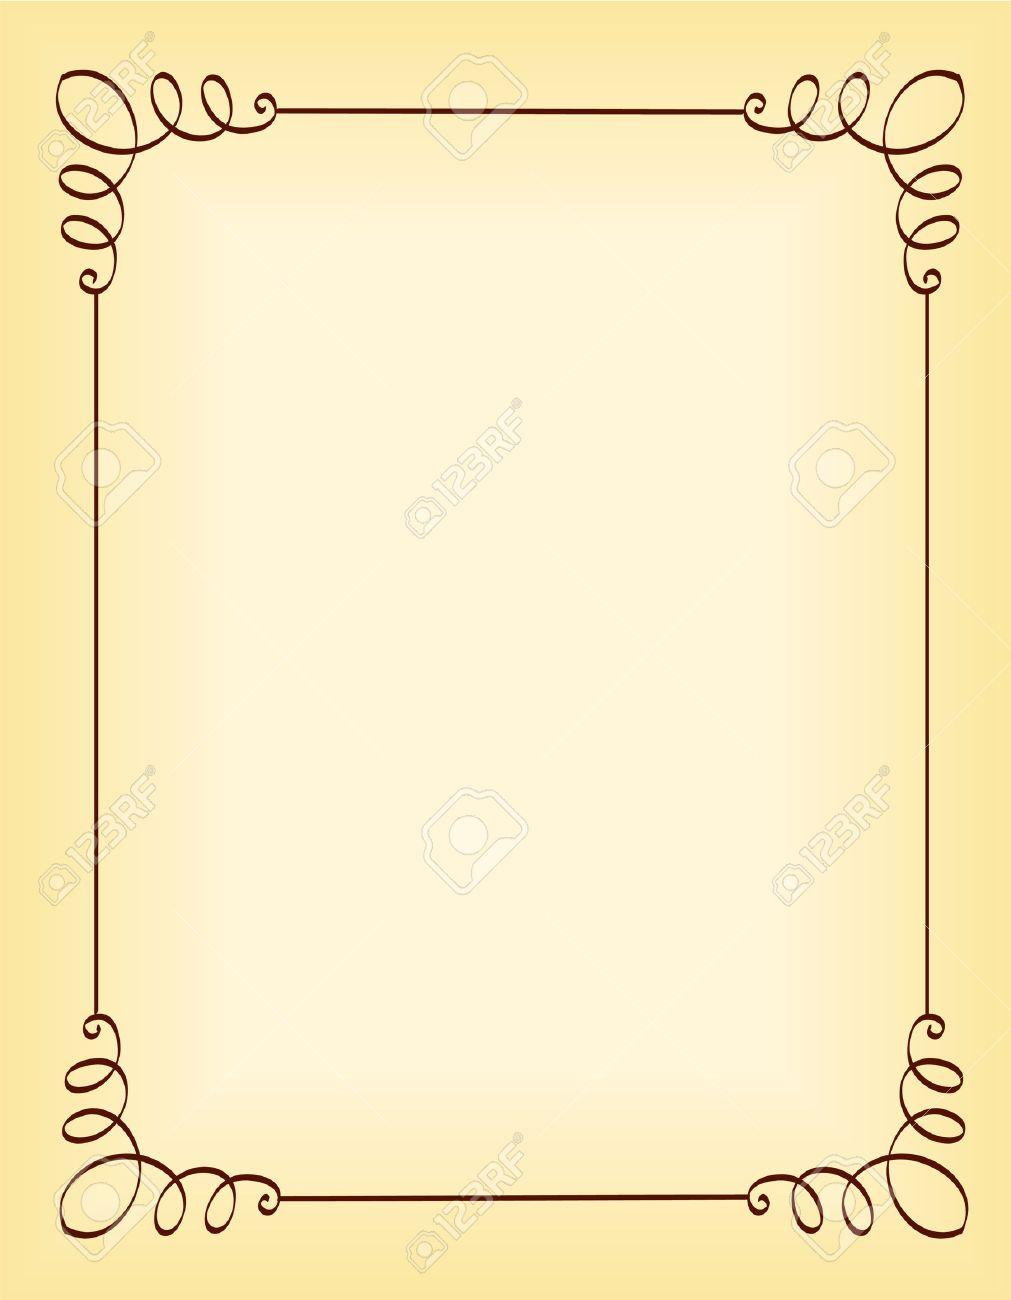 unique ornamental border frame for party invitation backgrounds